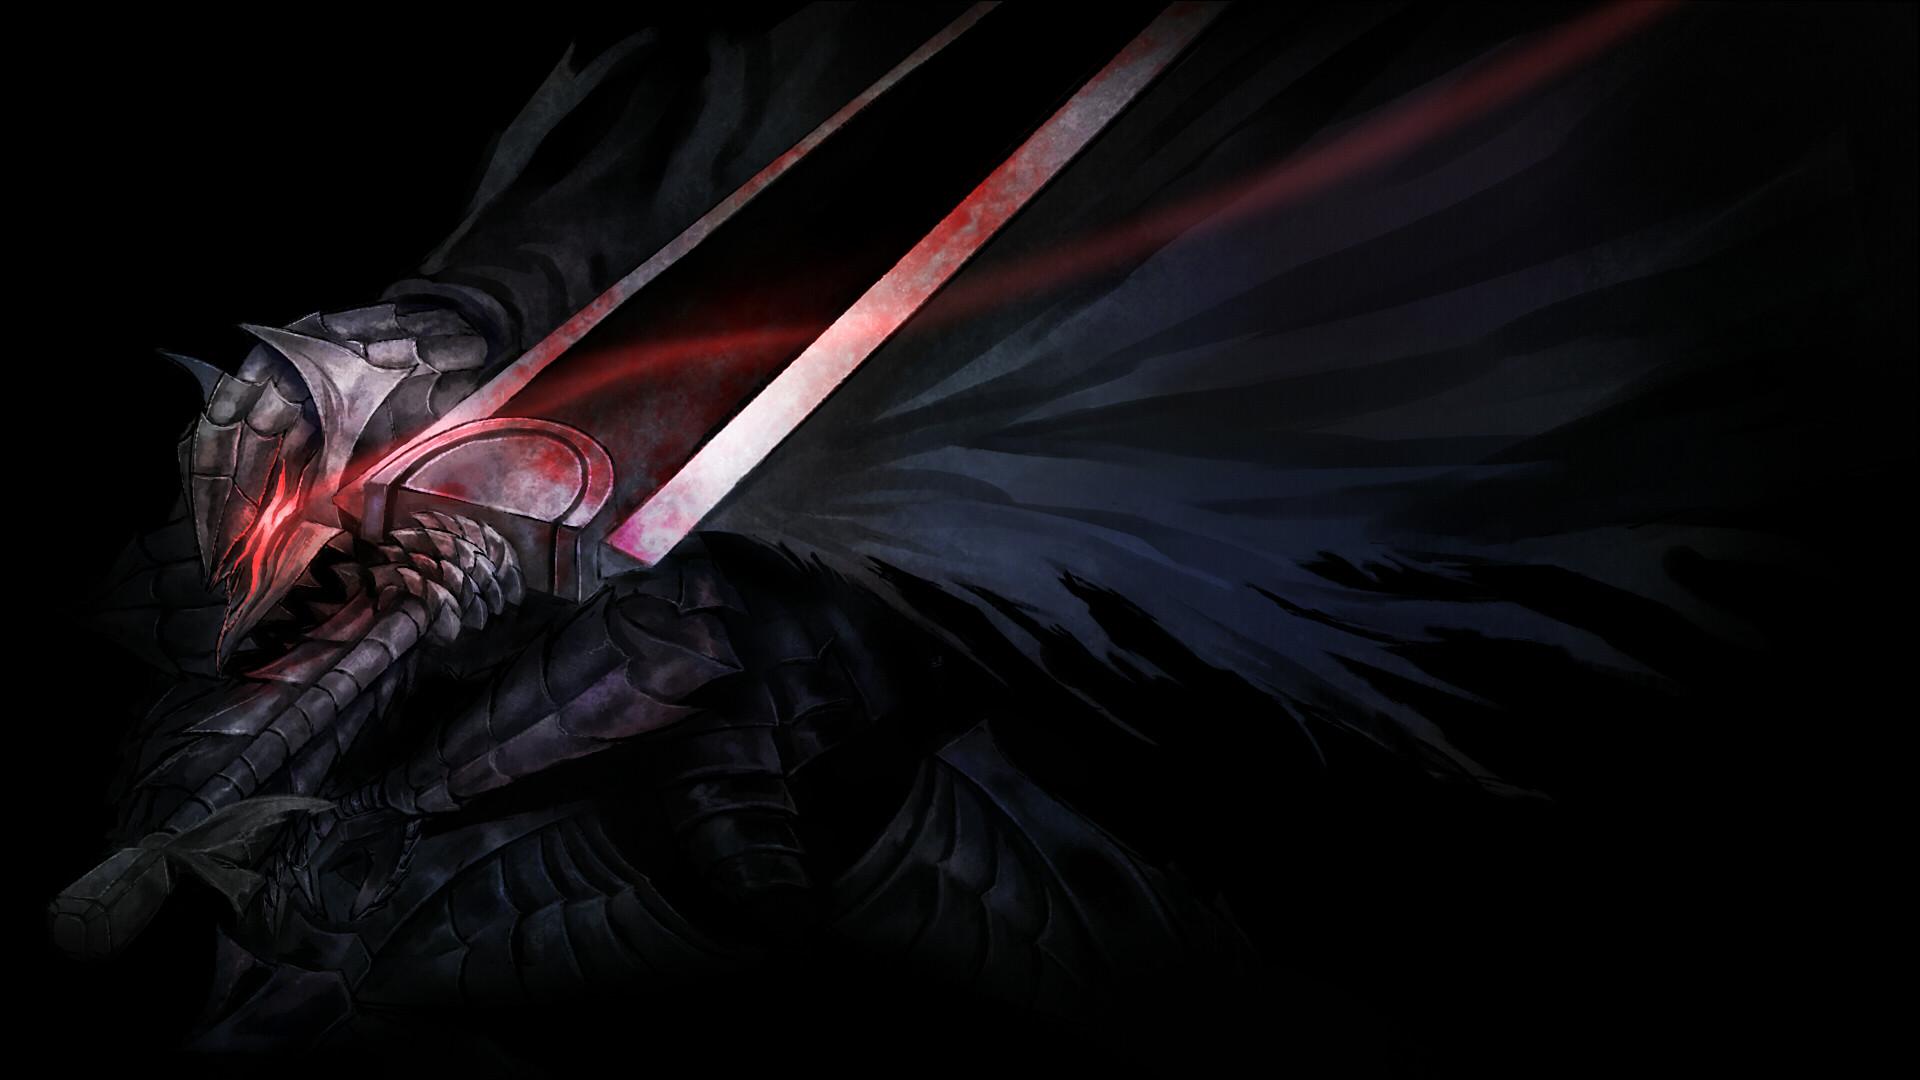 Res: 1920x1080, Anime - Berserk Guts (Berserk) Wallpaper